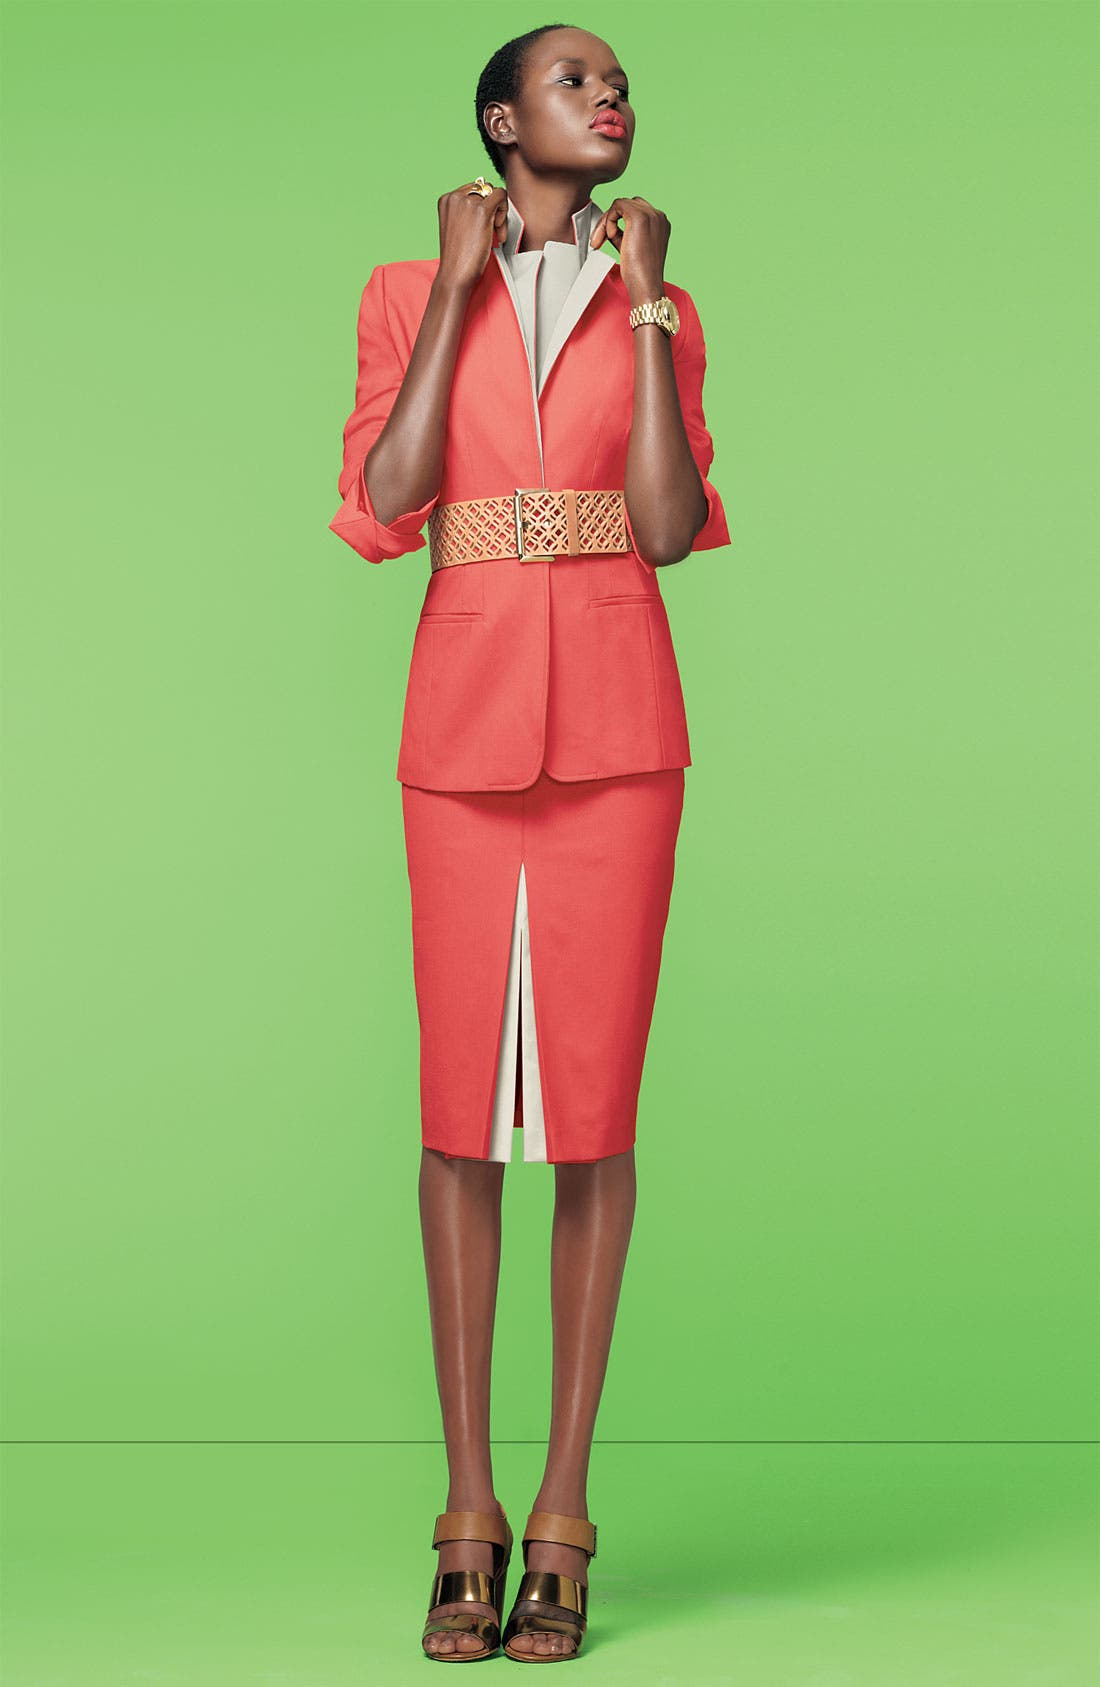 Alternate Image 3  - Elie Tahari Exclusive for Nordstrom 'Melissa' Contrast Trim Jacket (Nordstrom Exclusive)